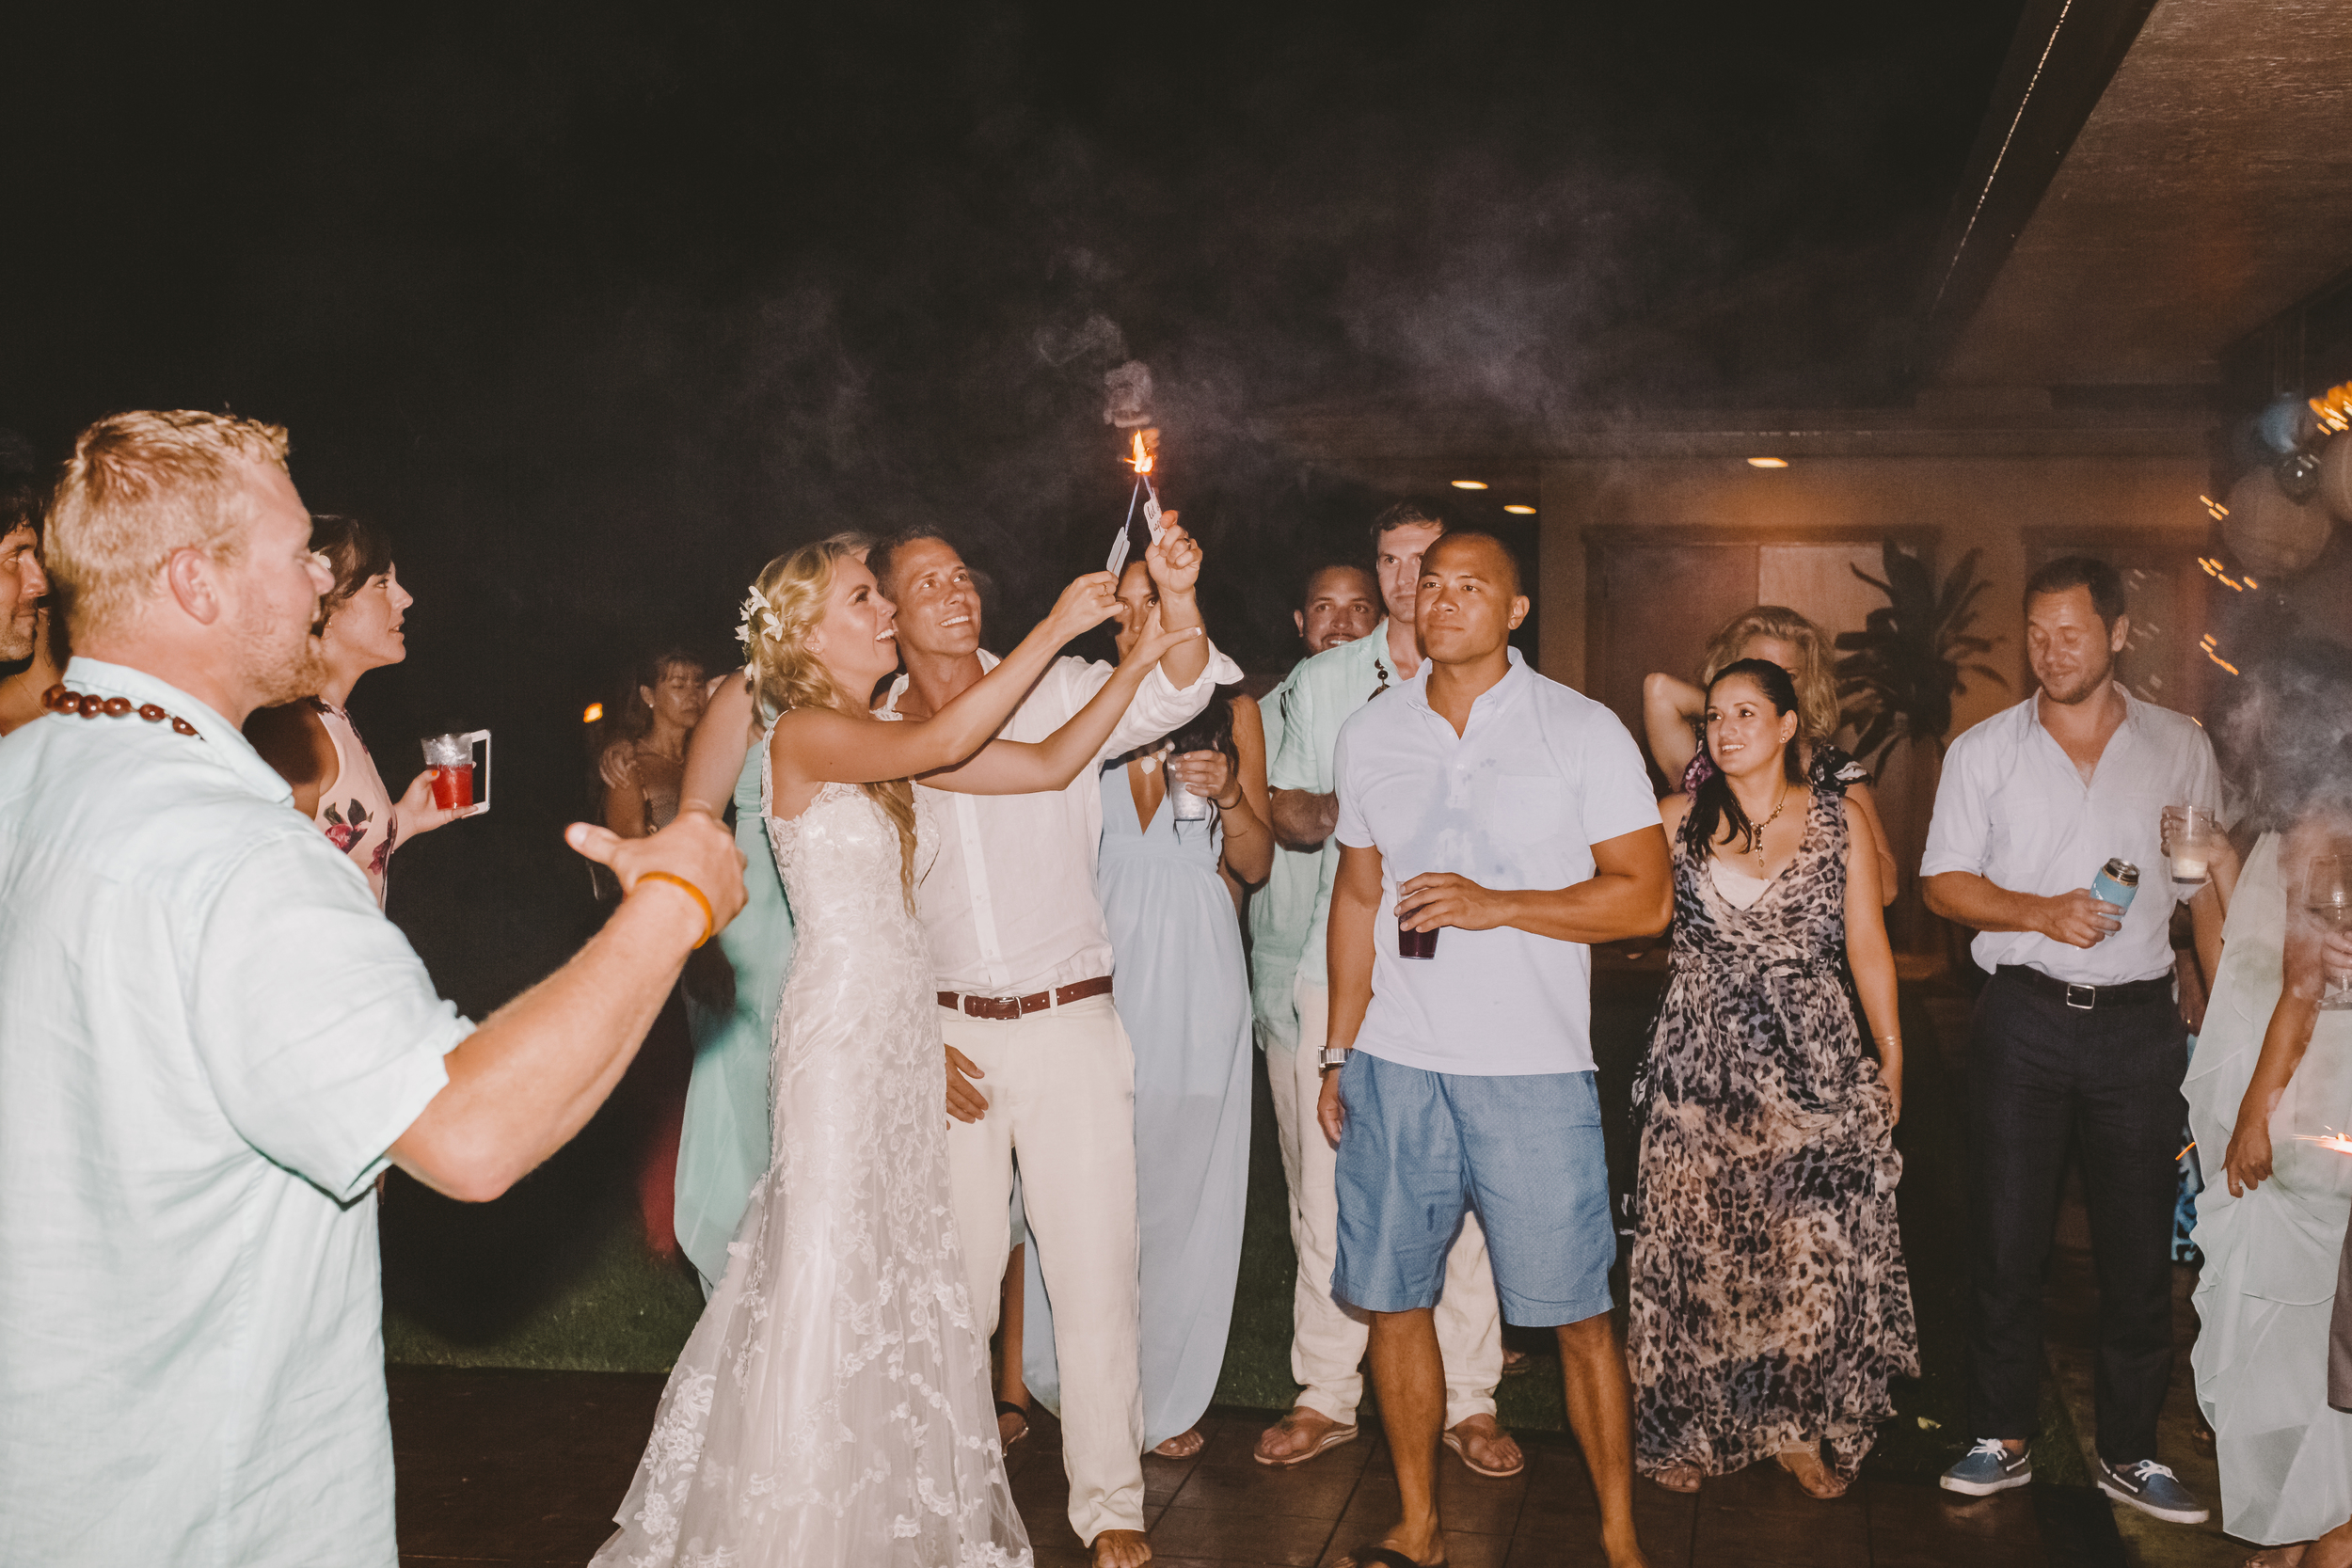 angie-diaz-photography-hawaii-wedding-photographer-kelli-jay-139.jpg